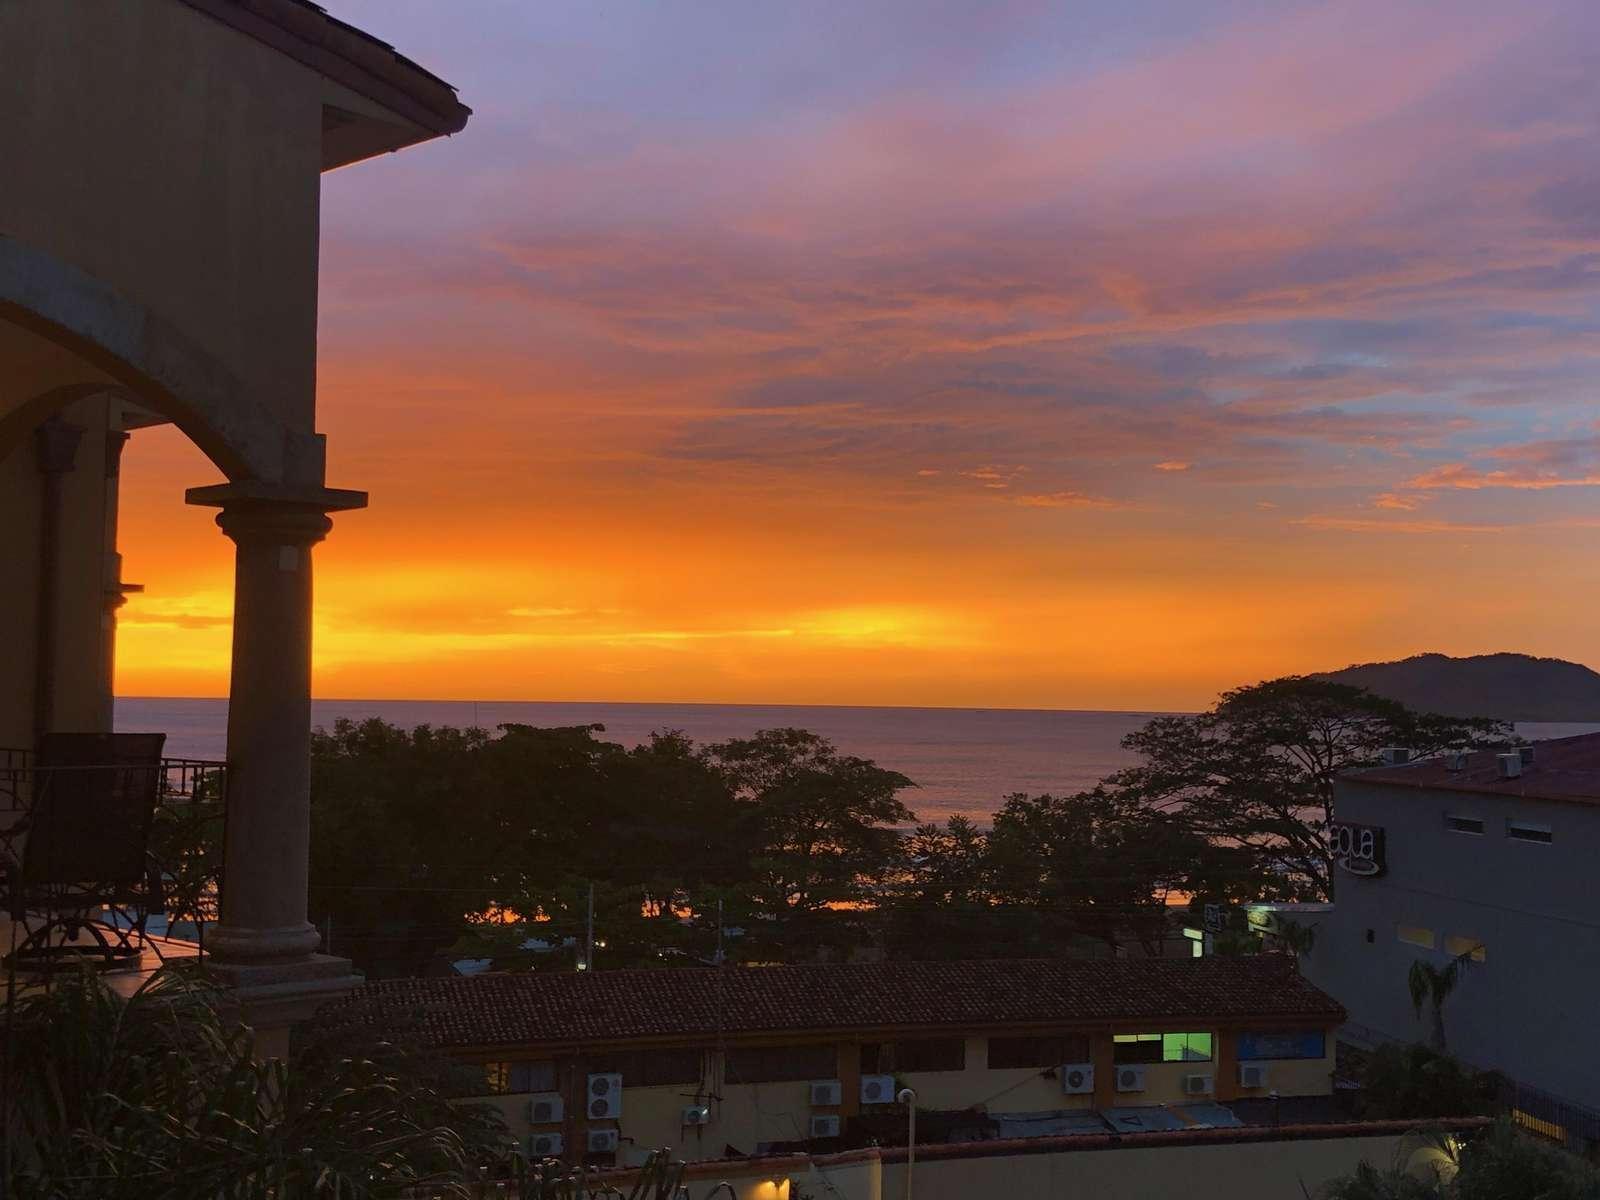 Sunrise 12, Sunset Ocean View